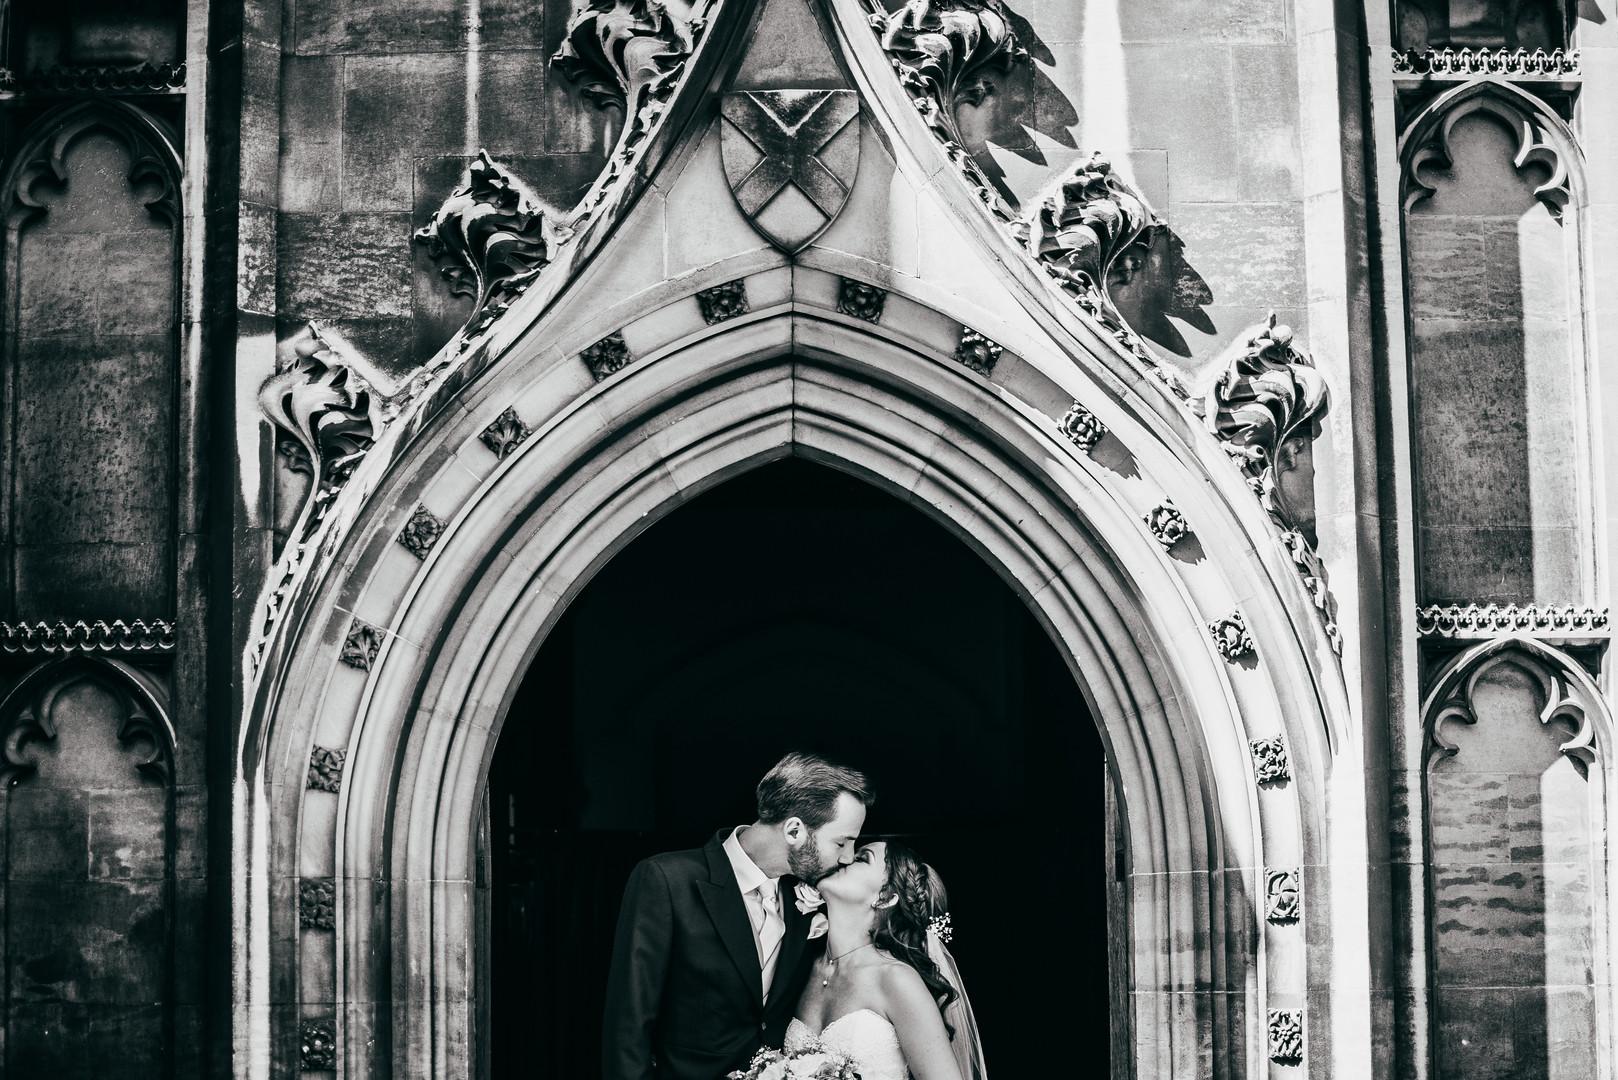 Kissing couple at wedding